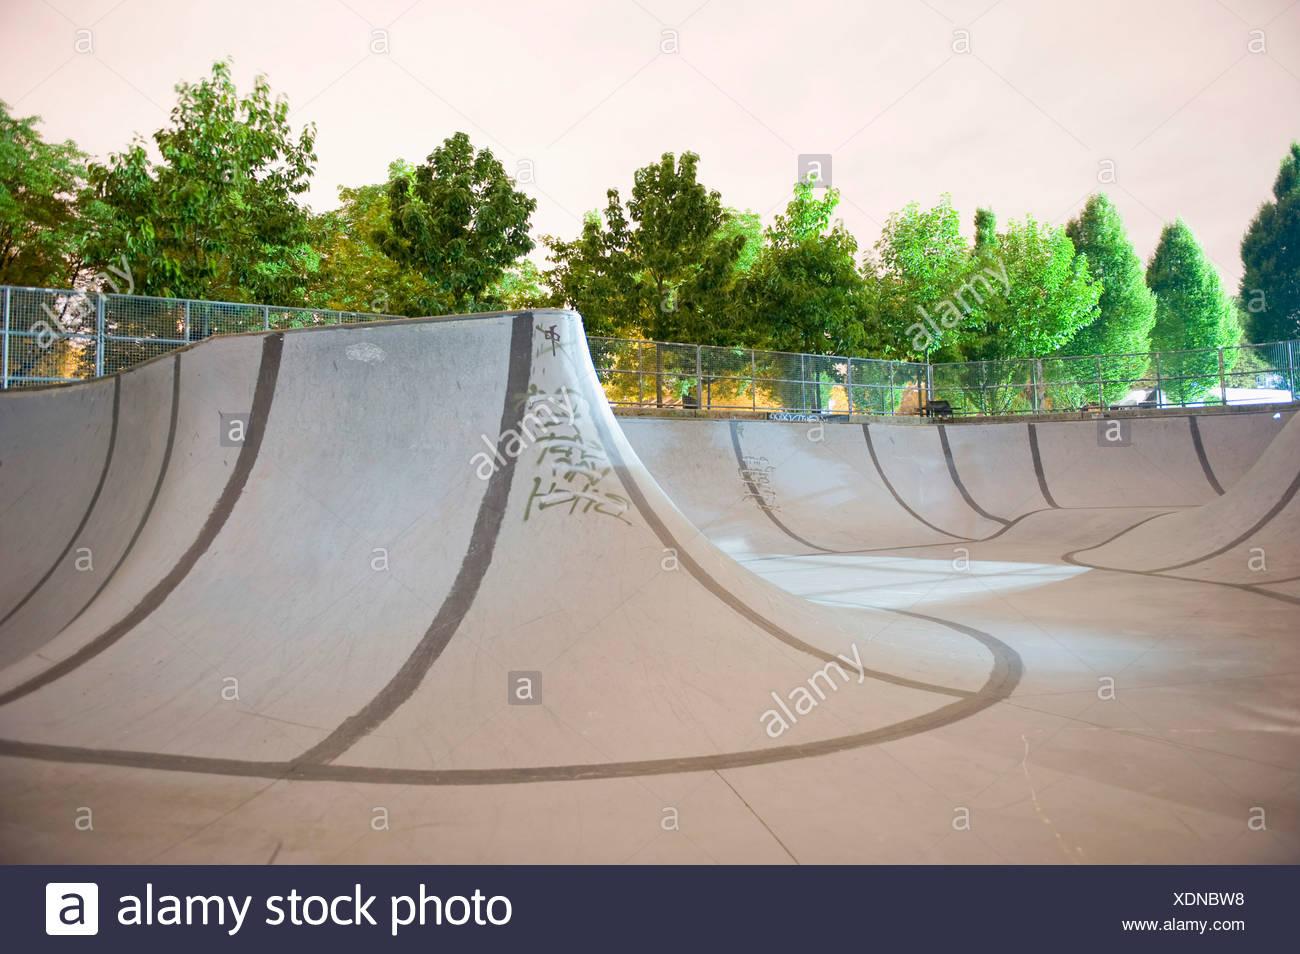 An empty skateboard park - Stock Image